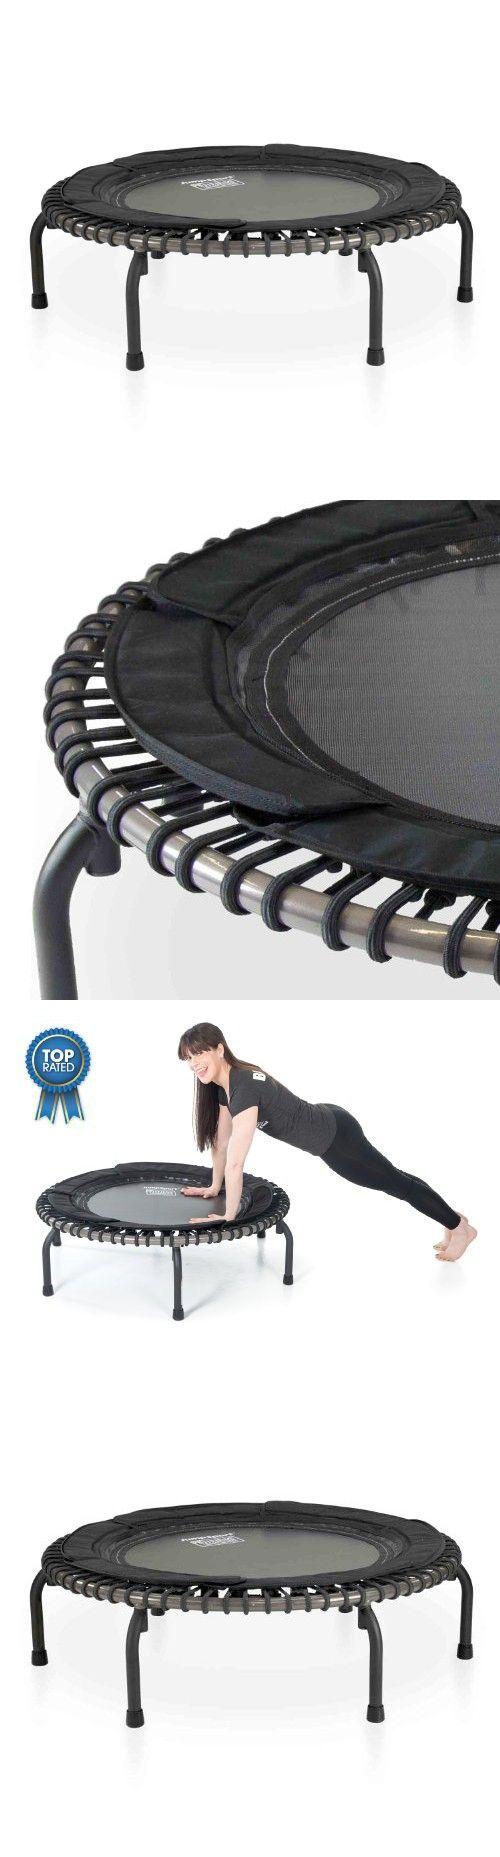 jumpsport fitness trampoline 570 pro ã â u201a â best seller ã â u201a â